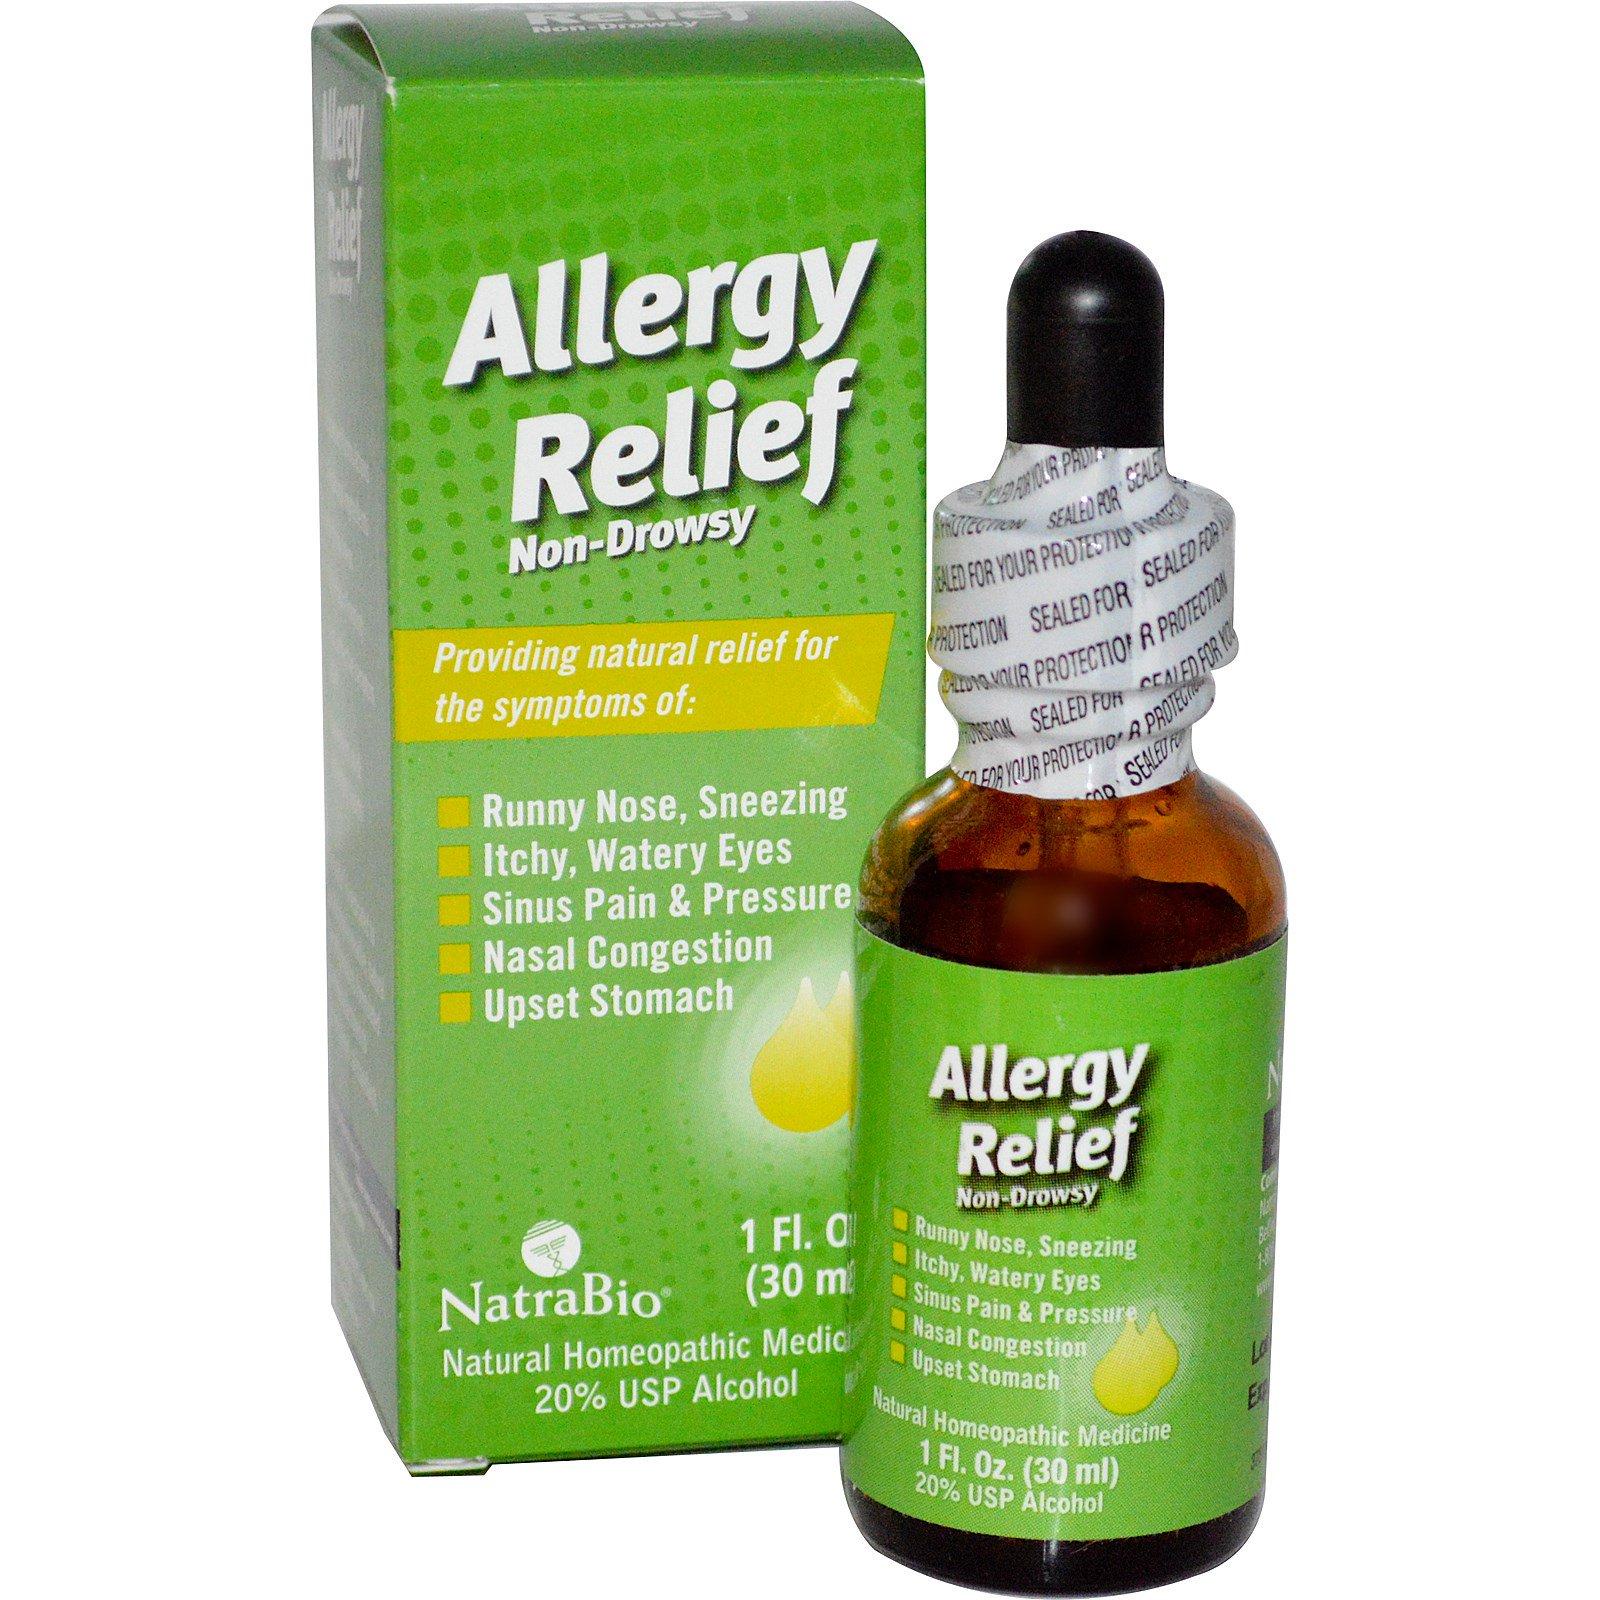 NatraBio Allergy Relief Non Drowsy 1 fl oz 30 ml iHerb